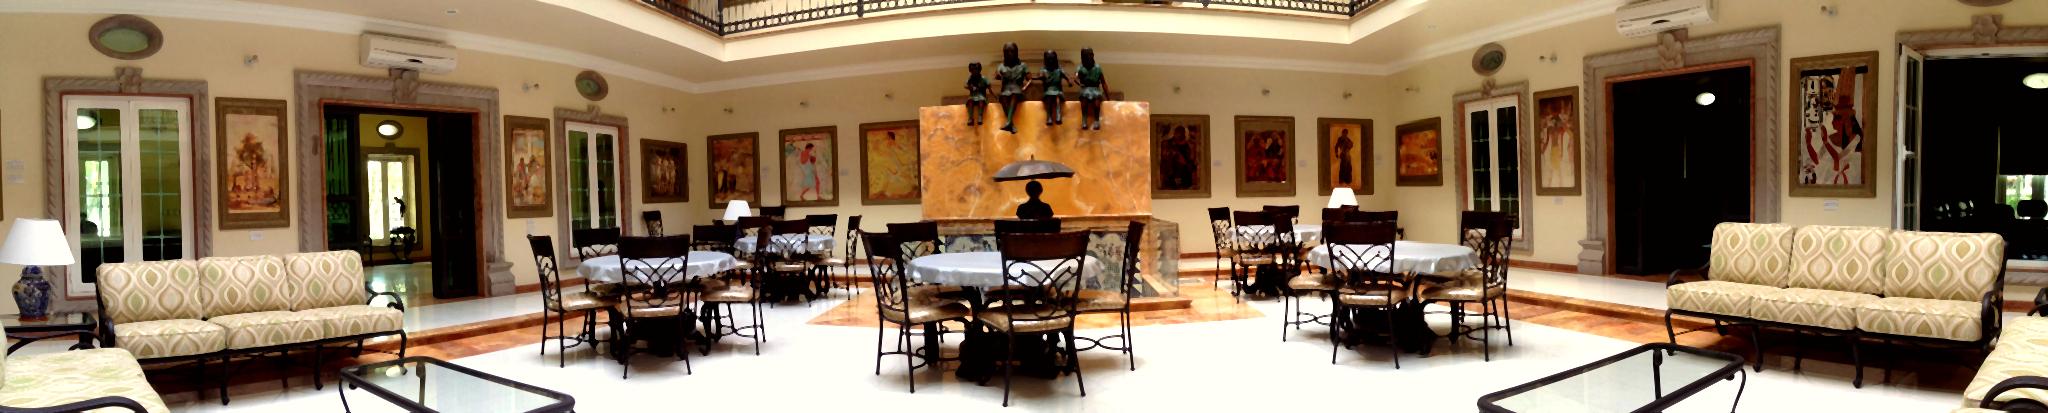 Comedor torre principal villa toscana 7.jpg